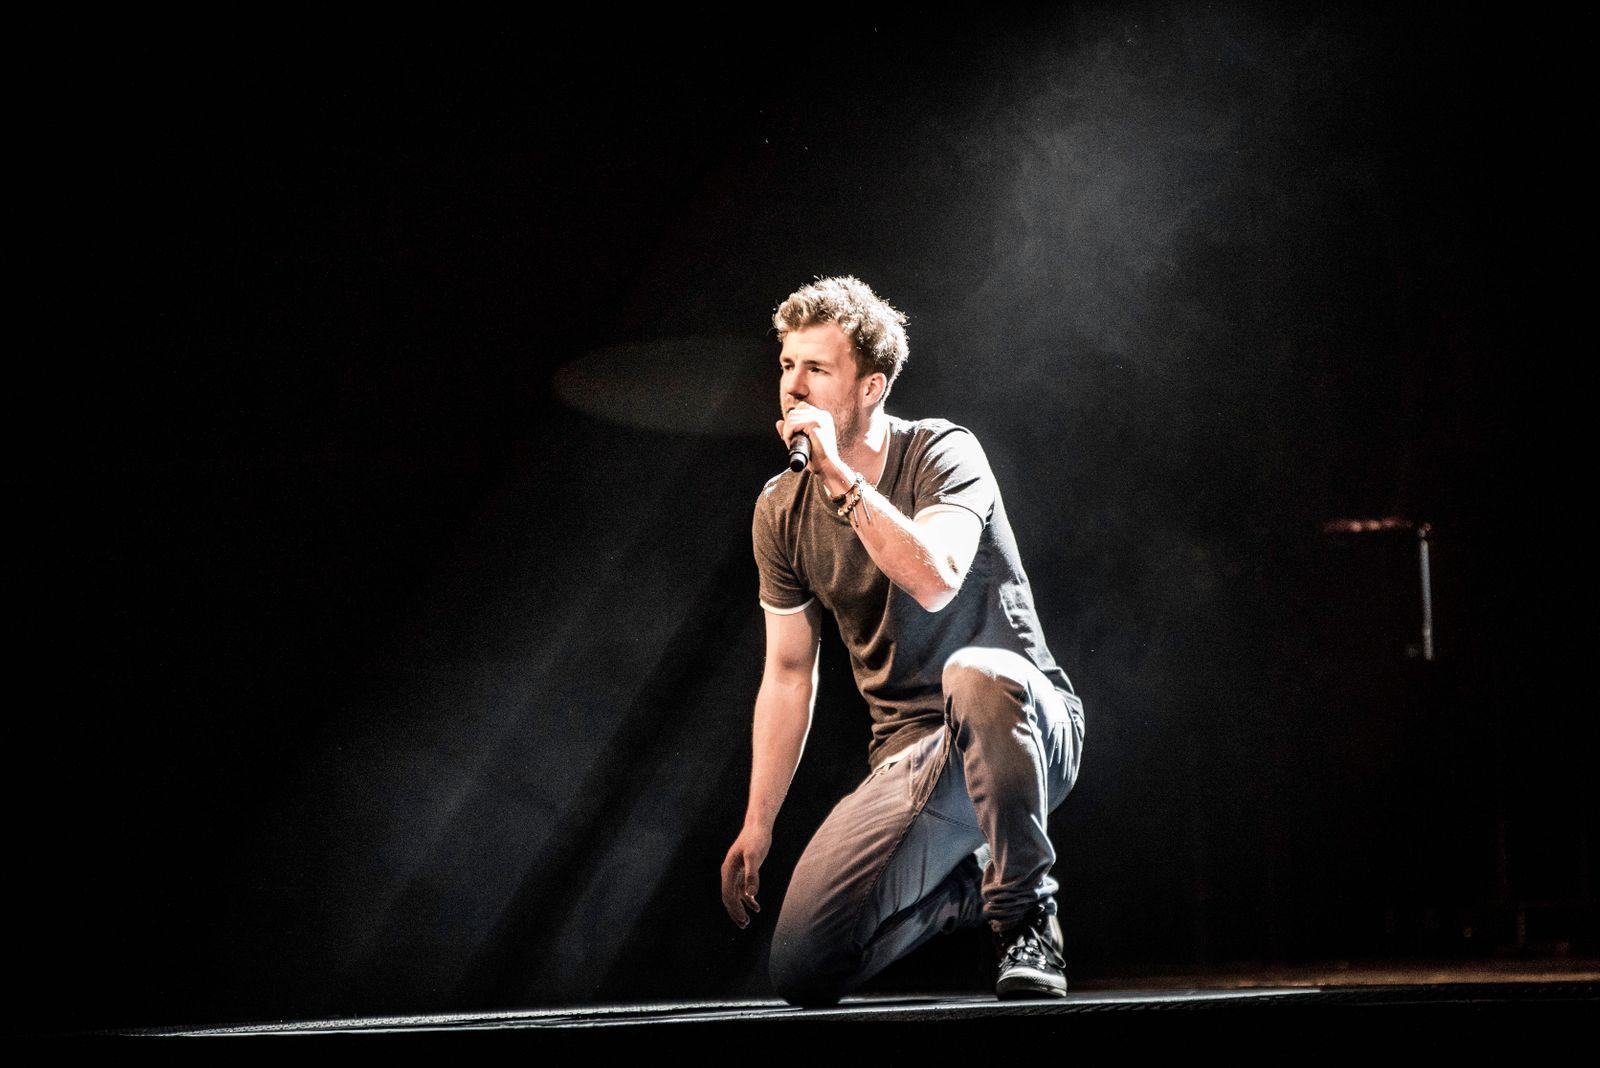 04 02 2018 Bamberg Brose Arena Luke Mockridge Lucky Man Tour 2018 Foto Luke Mockridge *** 04